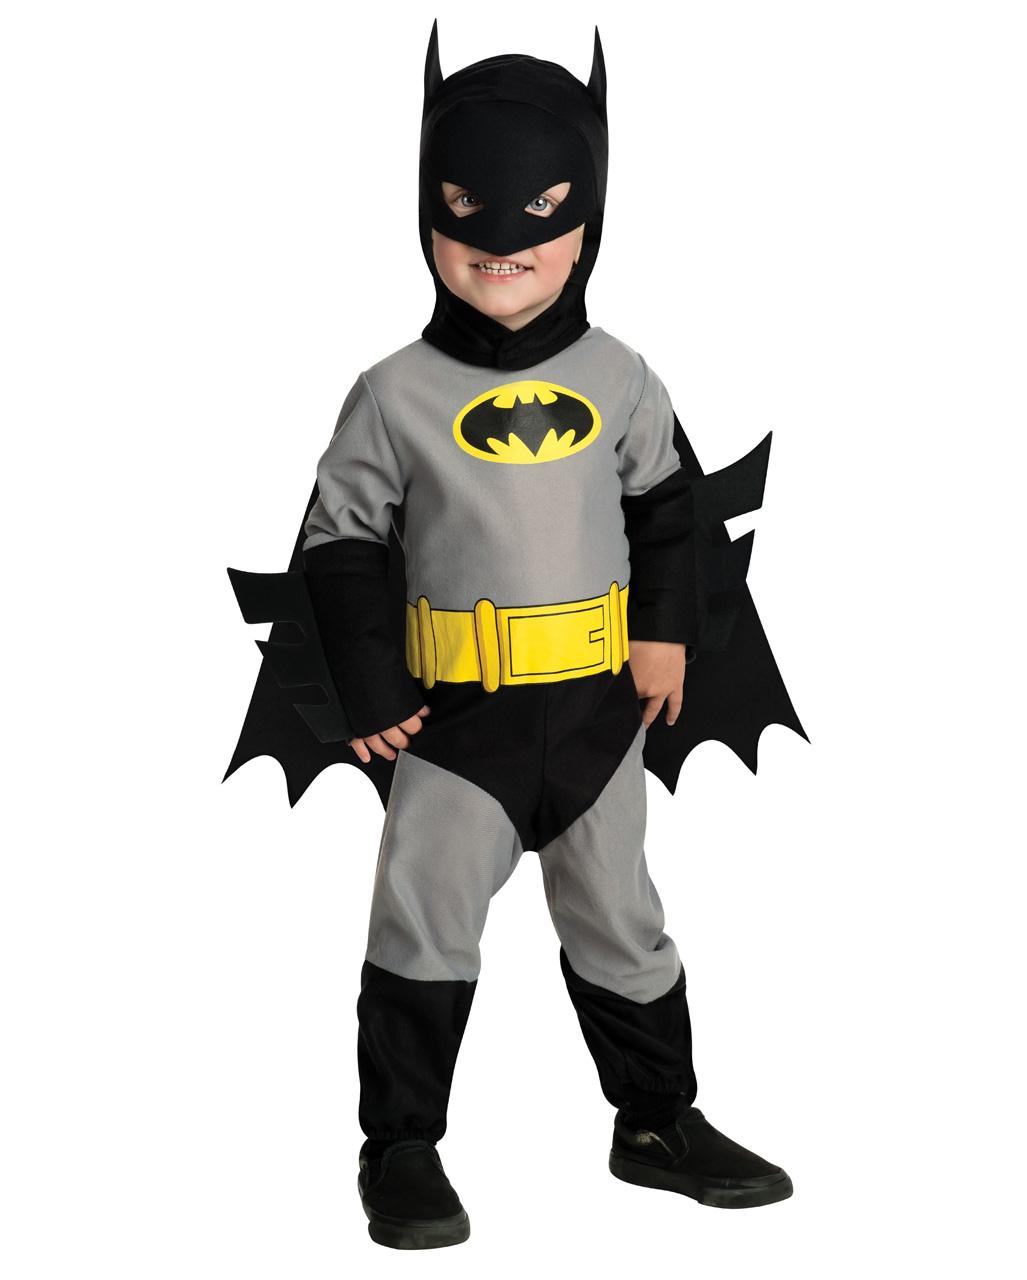 batman kleinkinder kost m one size f r superhelden horror. Black Bedroom Furniture Sets. Home Design Ideas